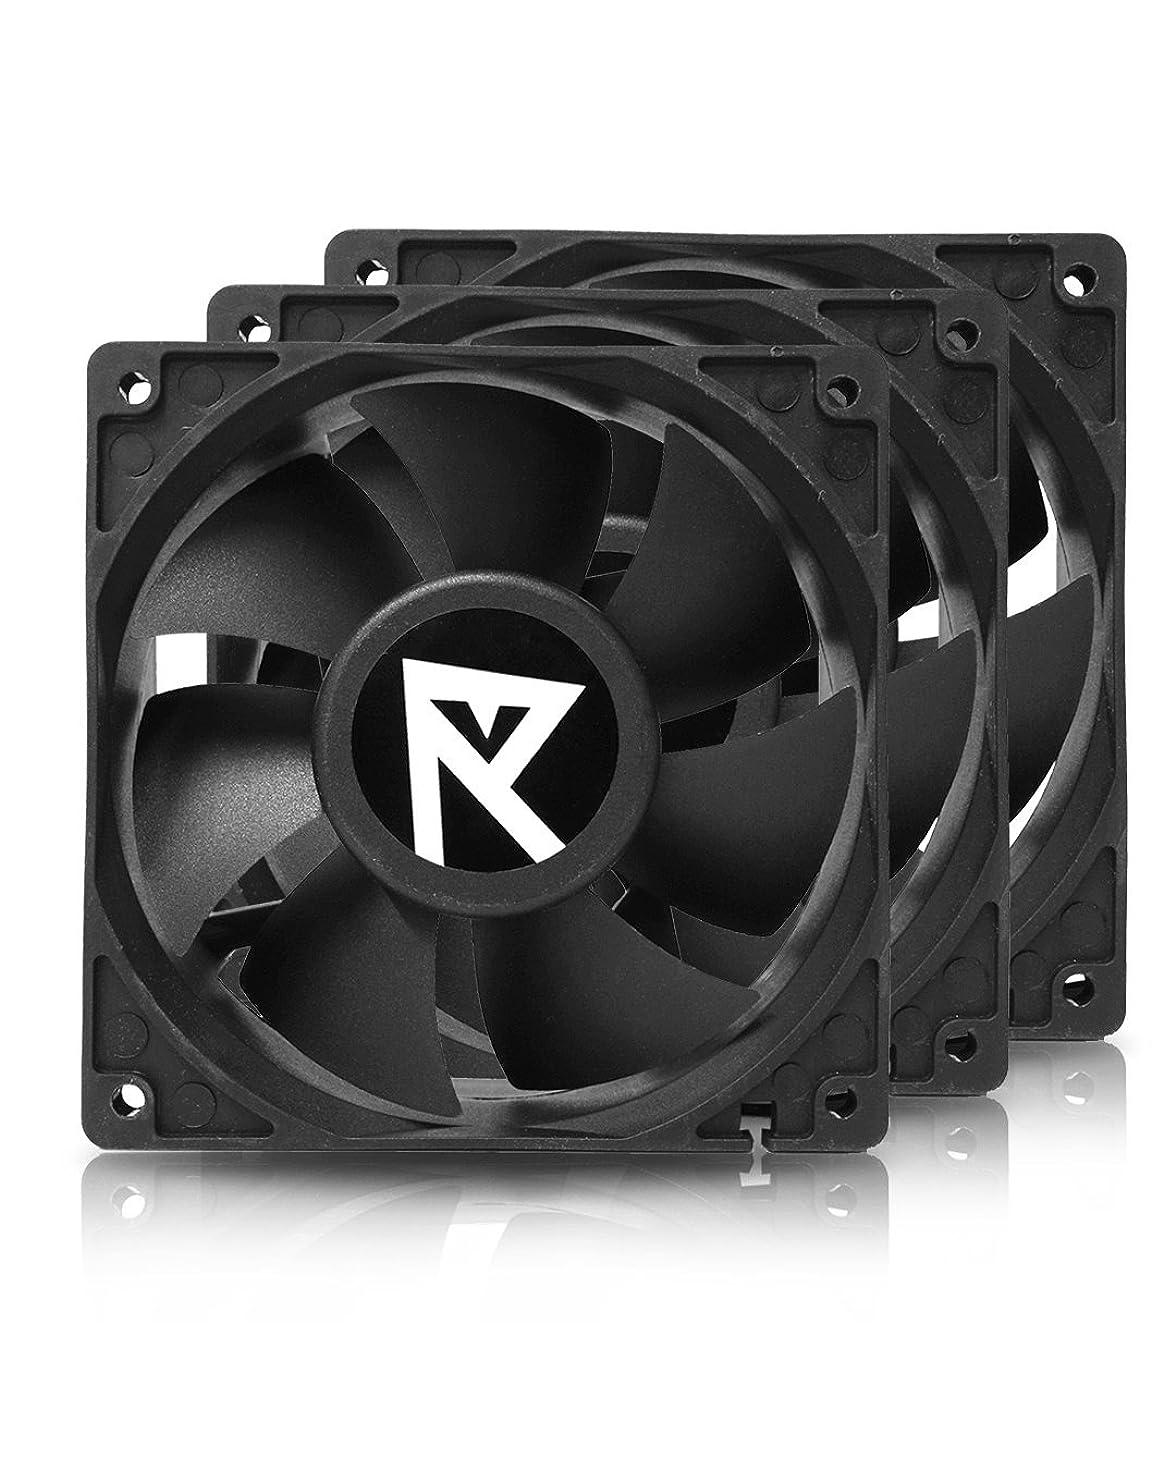 Hydra 120mm 4200rpm High Speed Fan for GPU Mining Rig Servers, 3 Pack